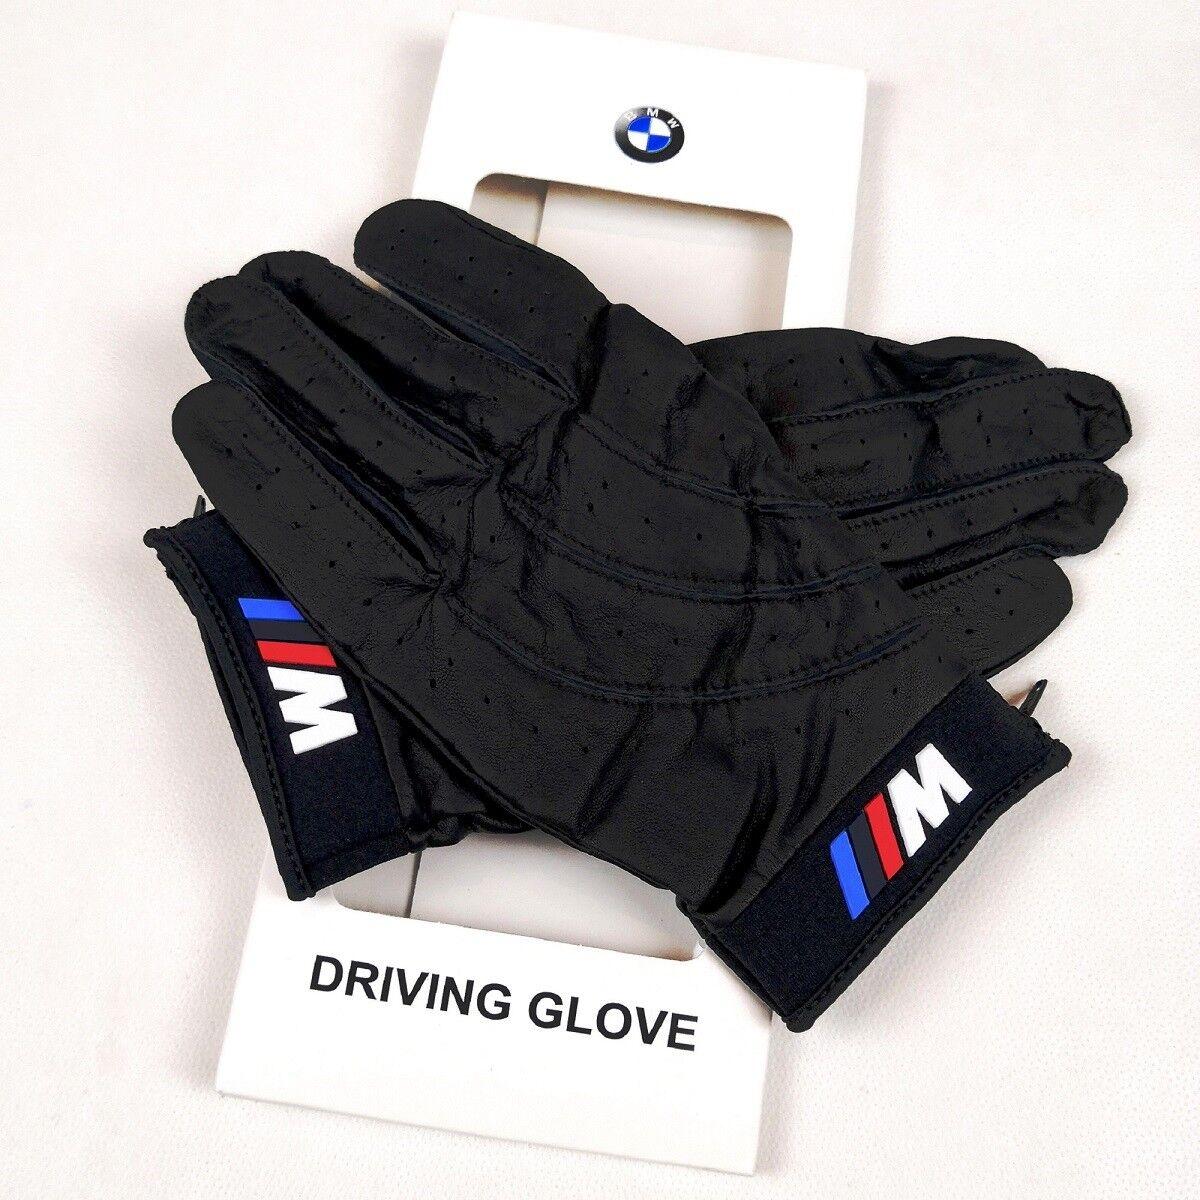 ORIGINAL ORIGINAL ORIGINAL BMW MOTORSPORT RACING LEDER HANDSCHUHE 1er X1 X3 X5 X6 Z1 Z3 Z4 Z8   Charmantes Design  12d146